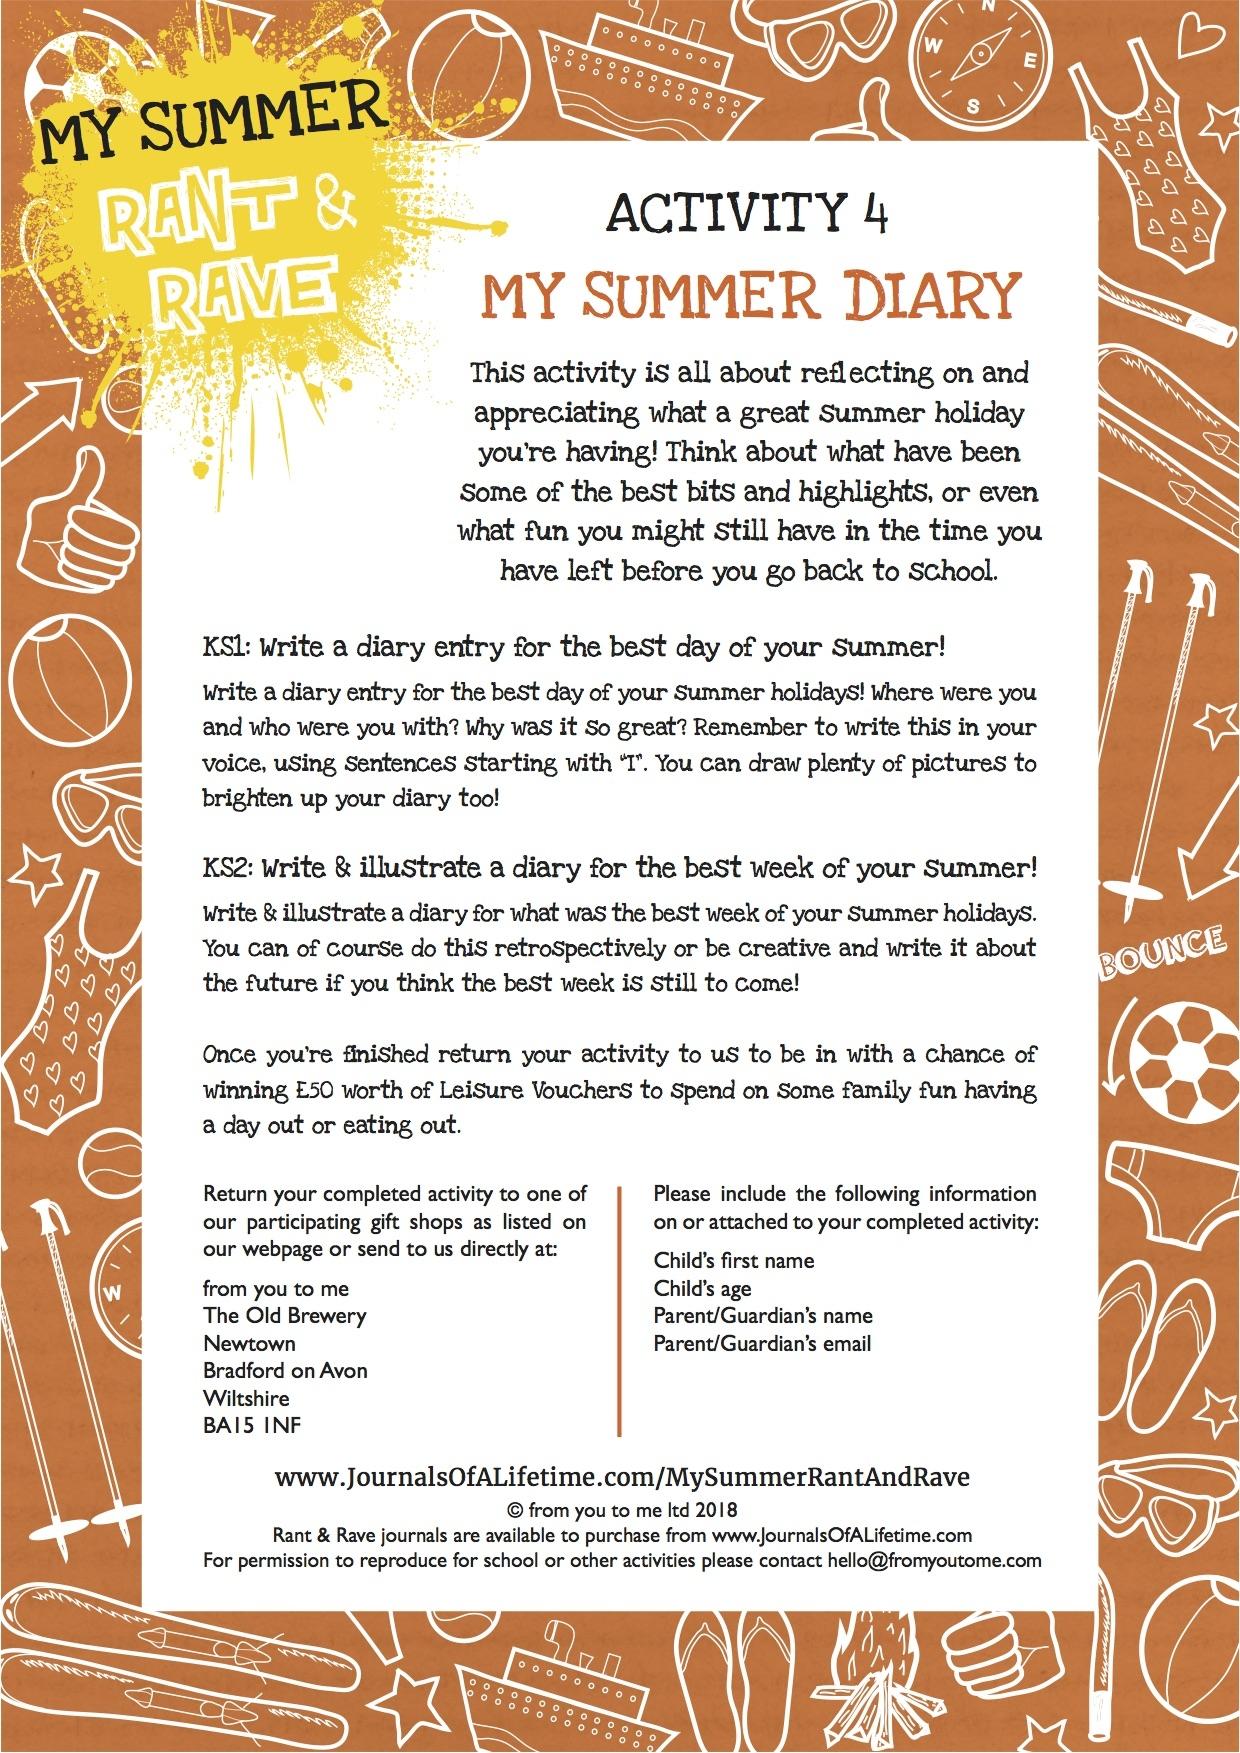 My Summer Diary